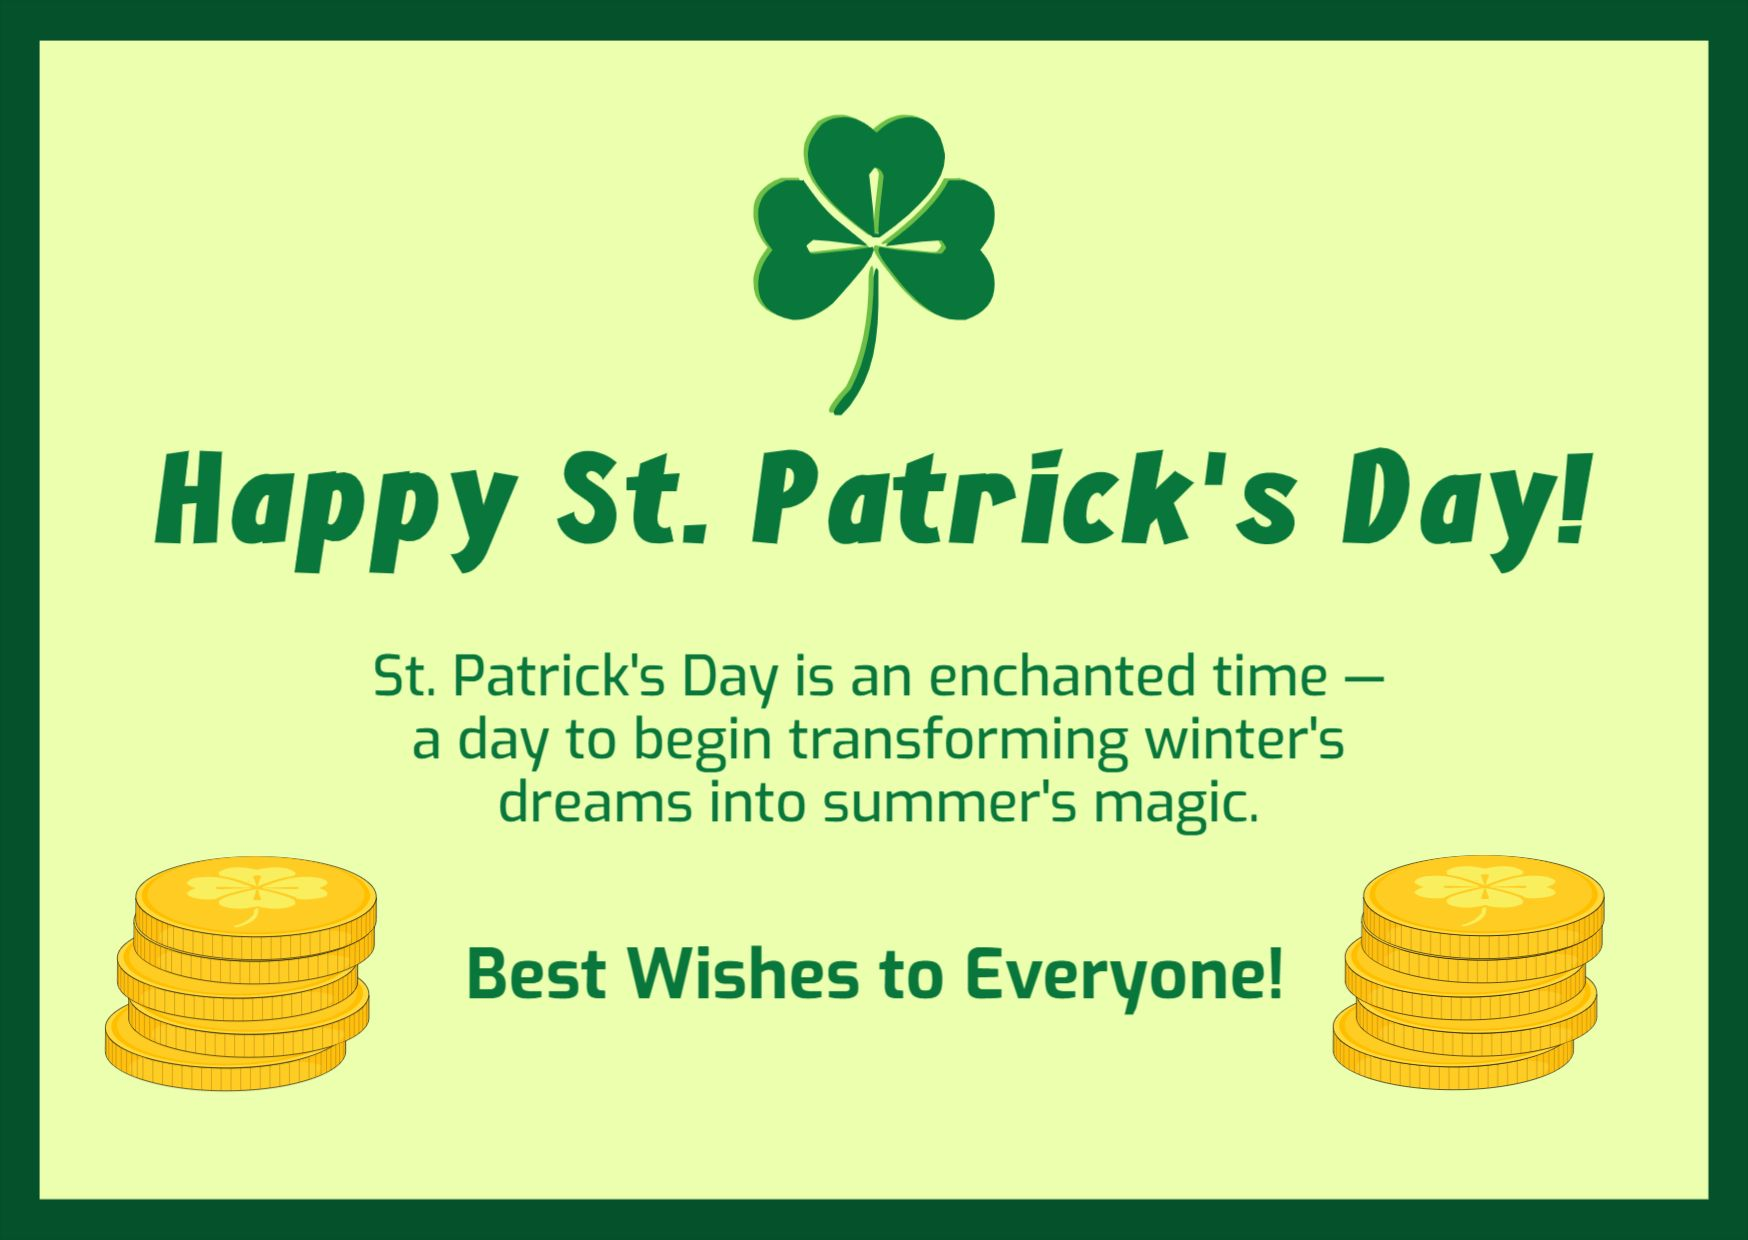 St Patricks Day Greetings Template